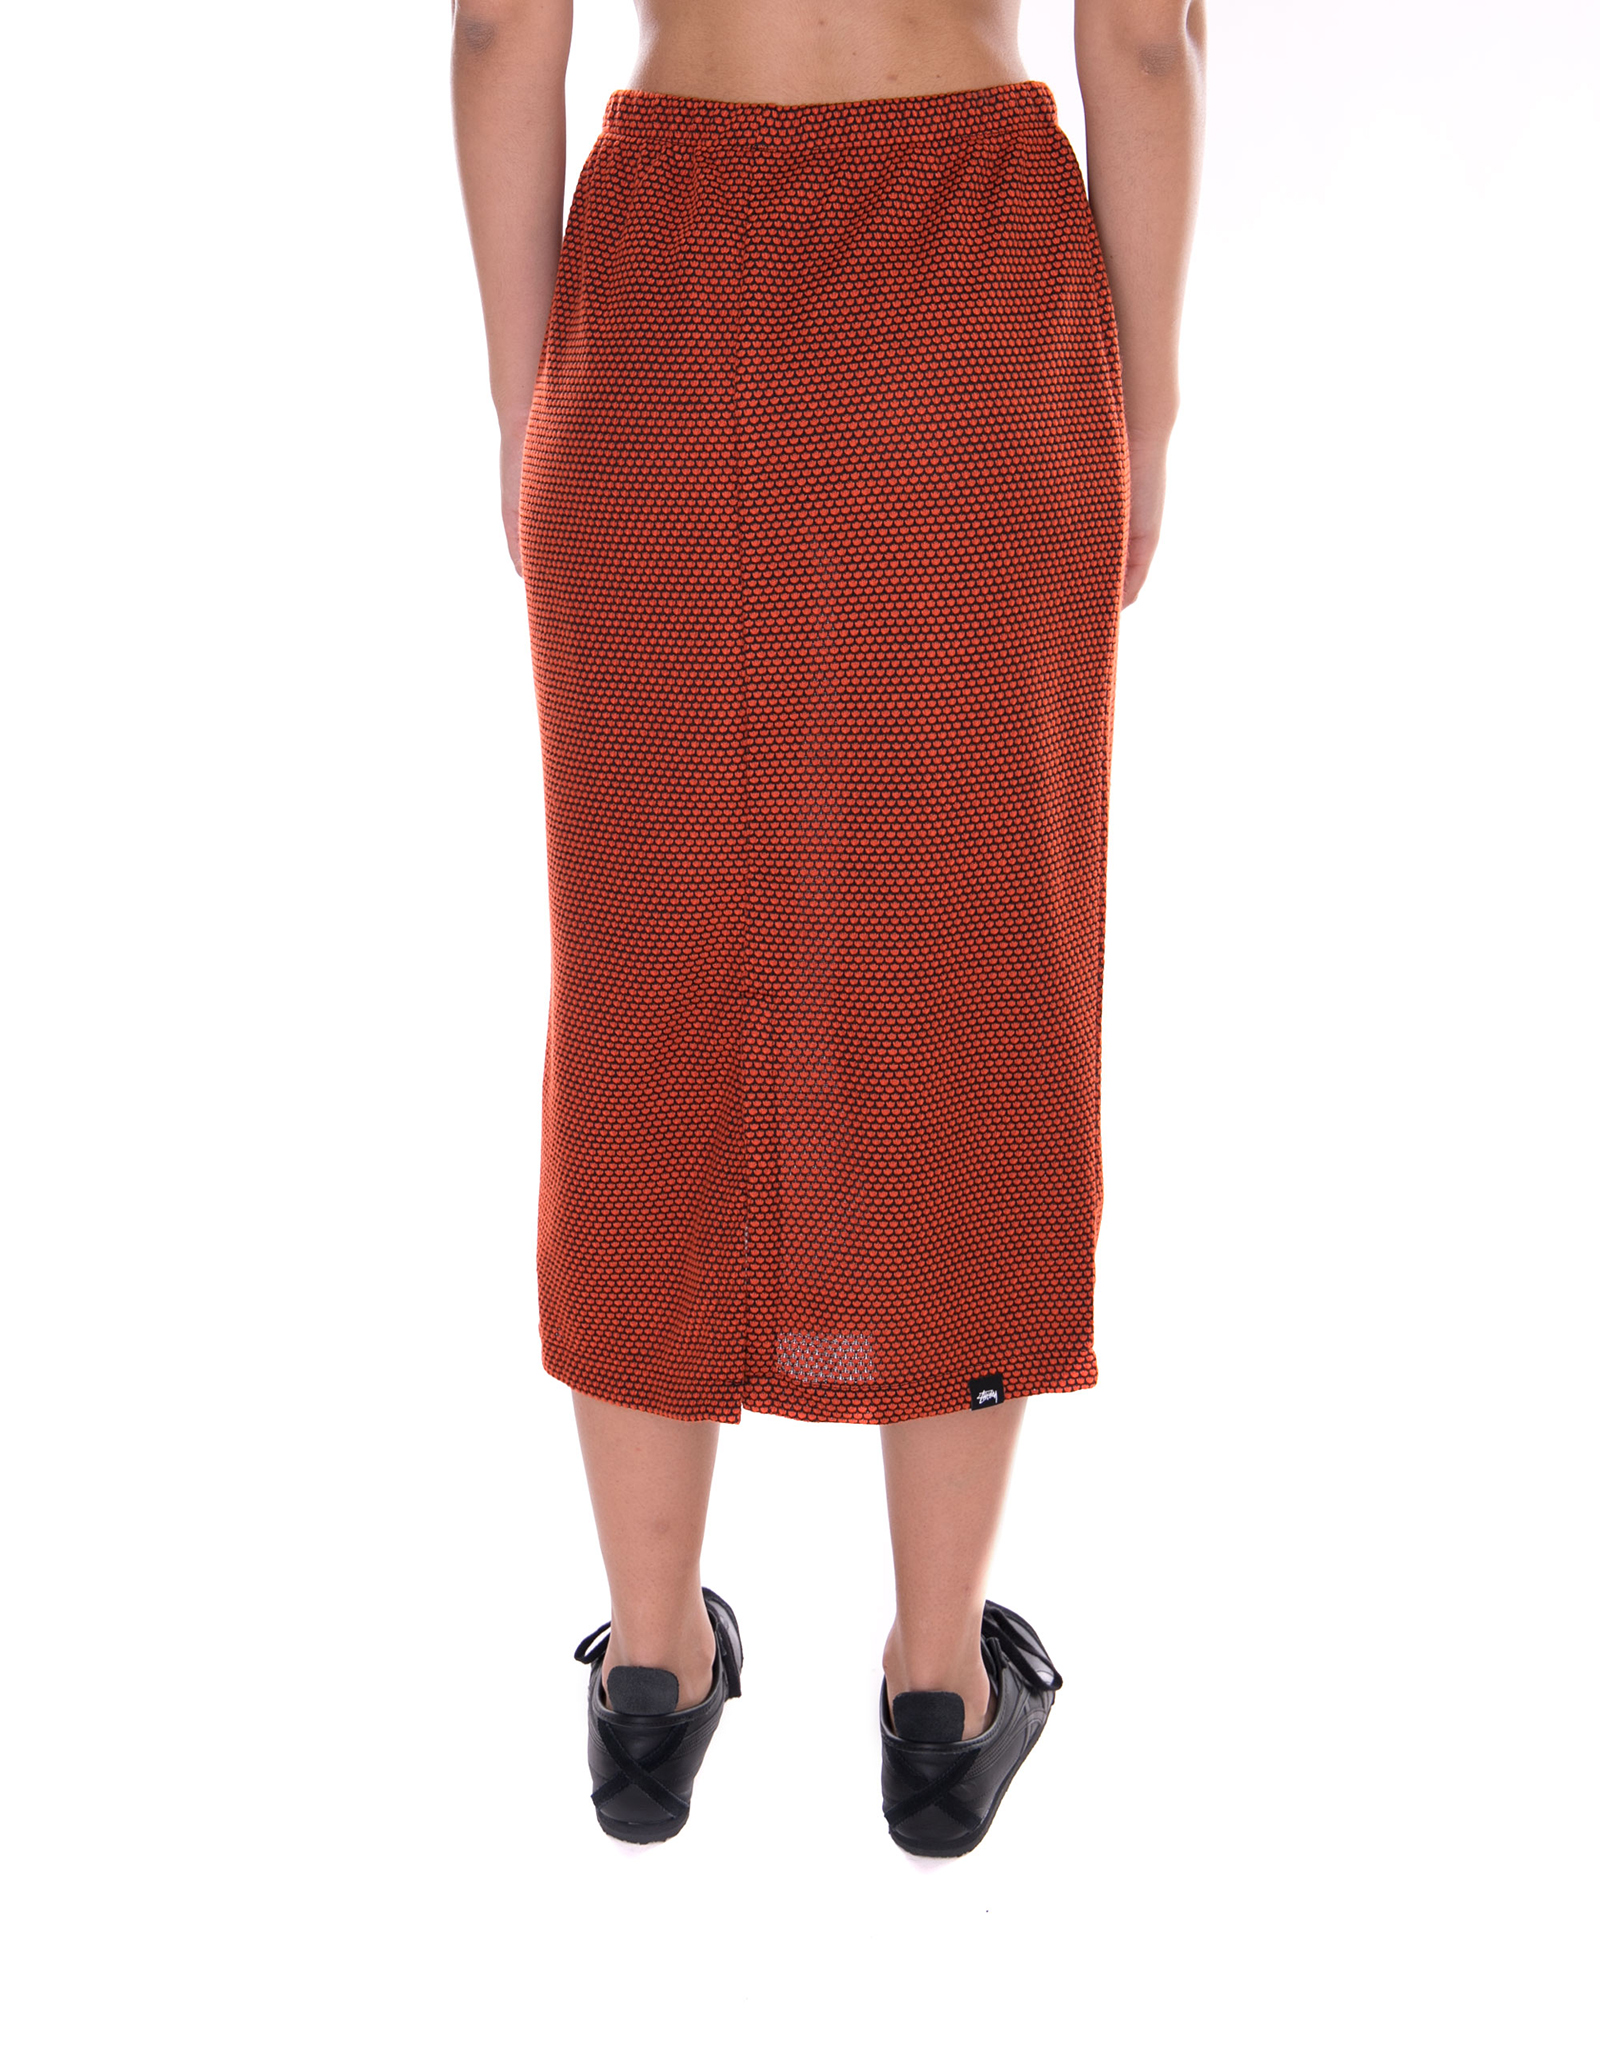 Stussy Gonne Gonne Gonne Faye Tube Skirt arancia Arancione cb3c30